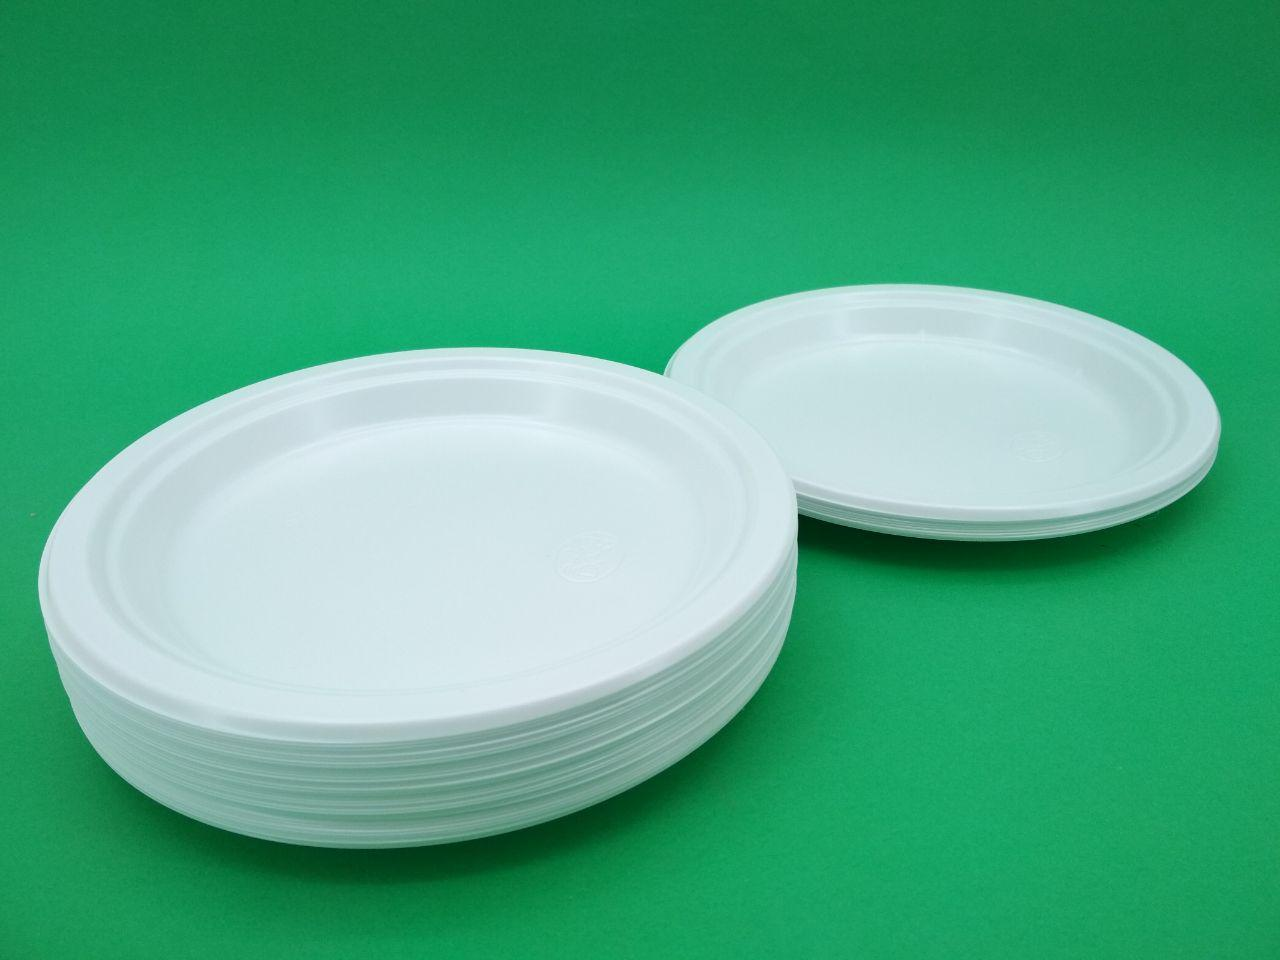 Тарелка одноразовая пластиковая 220 mm белая (50шт)